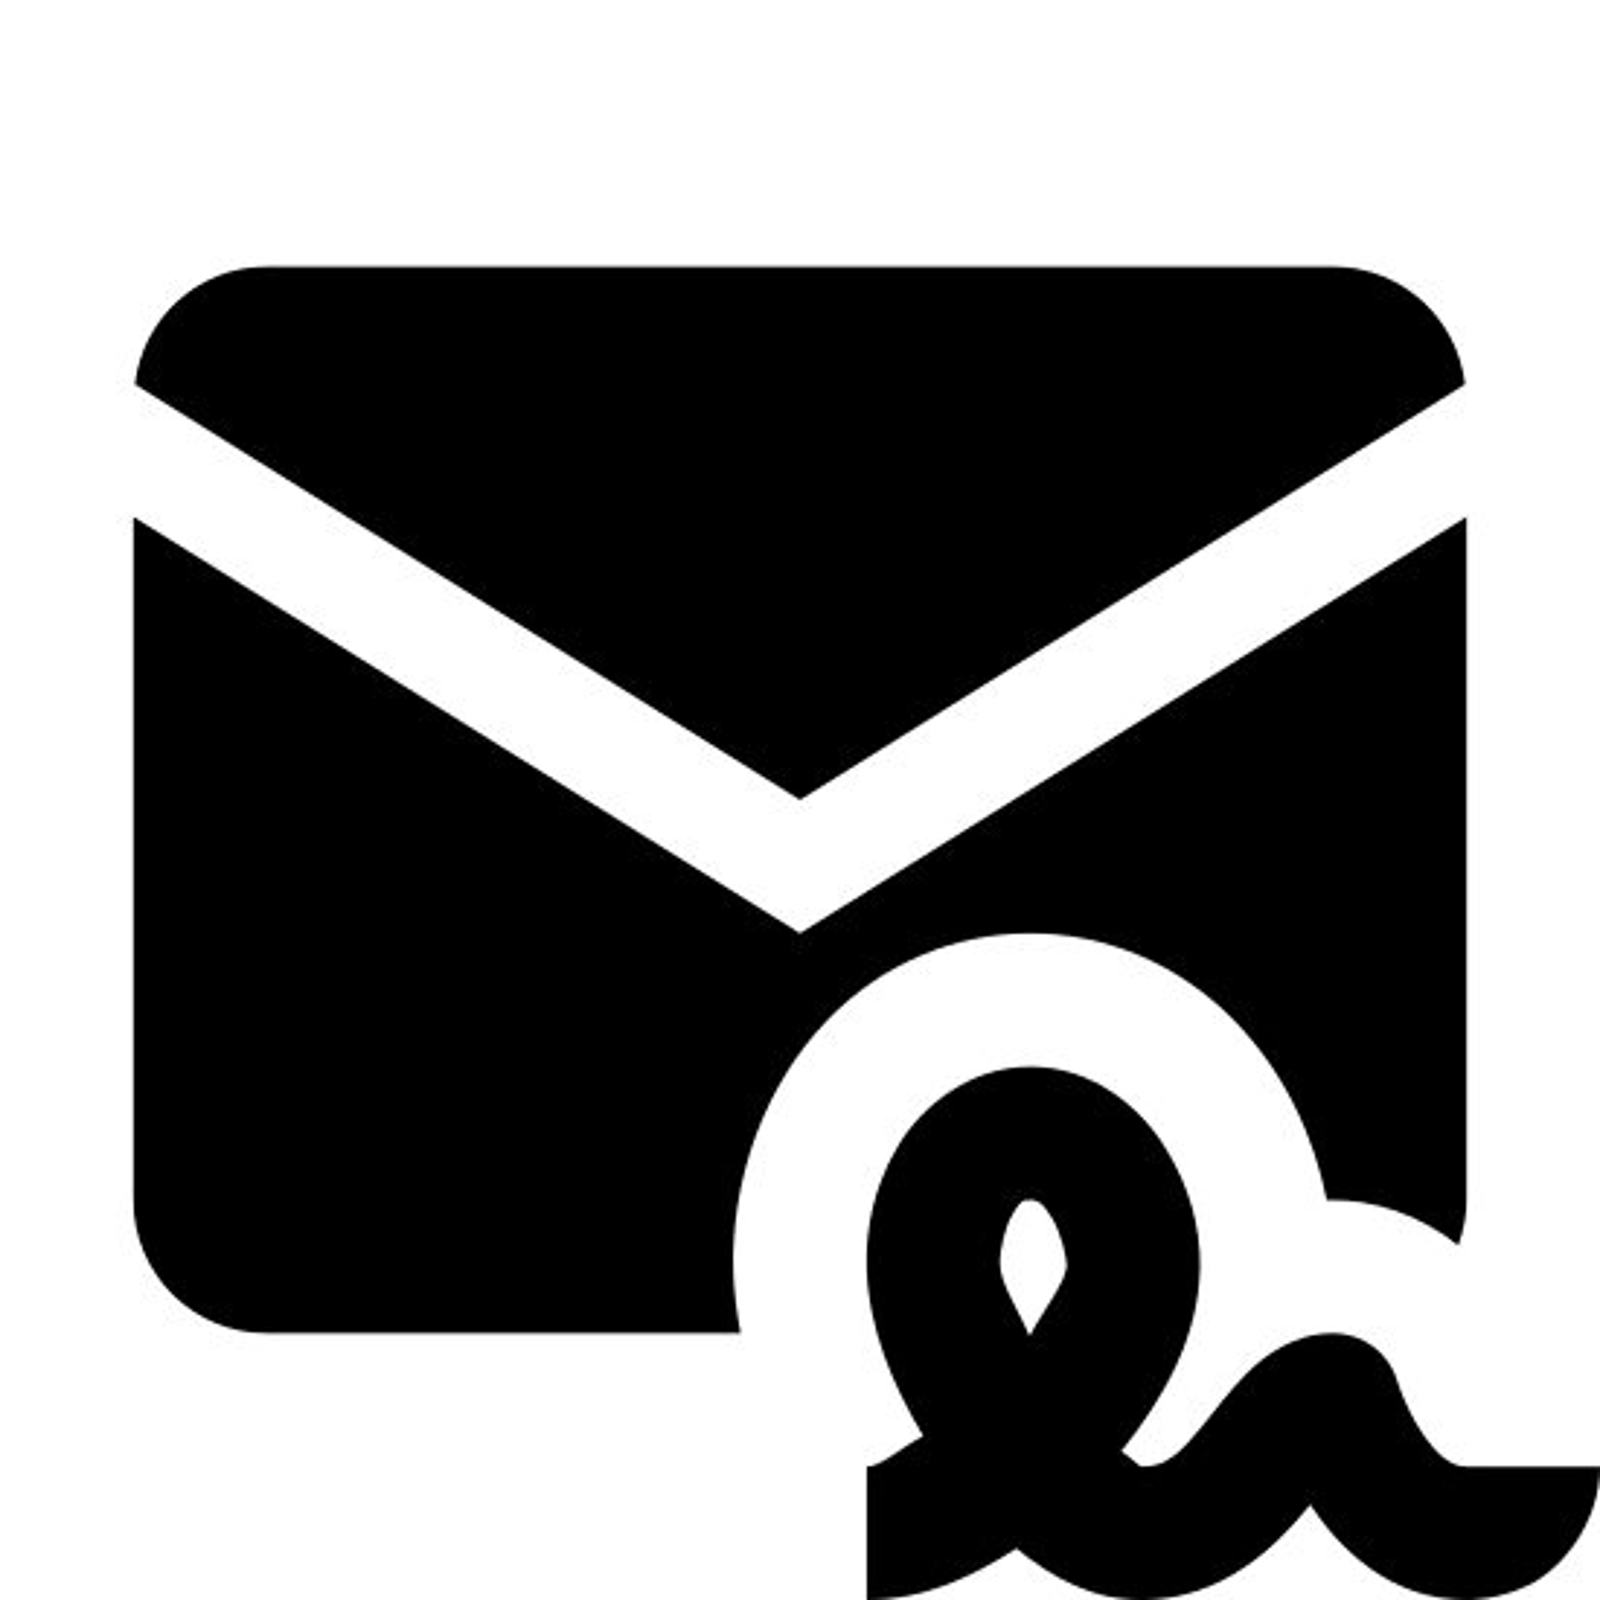 Подписать почту icon